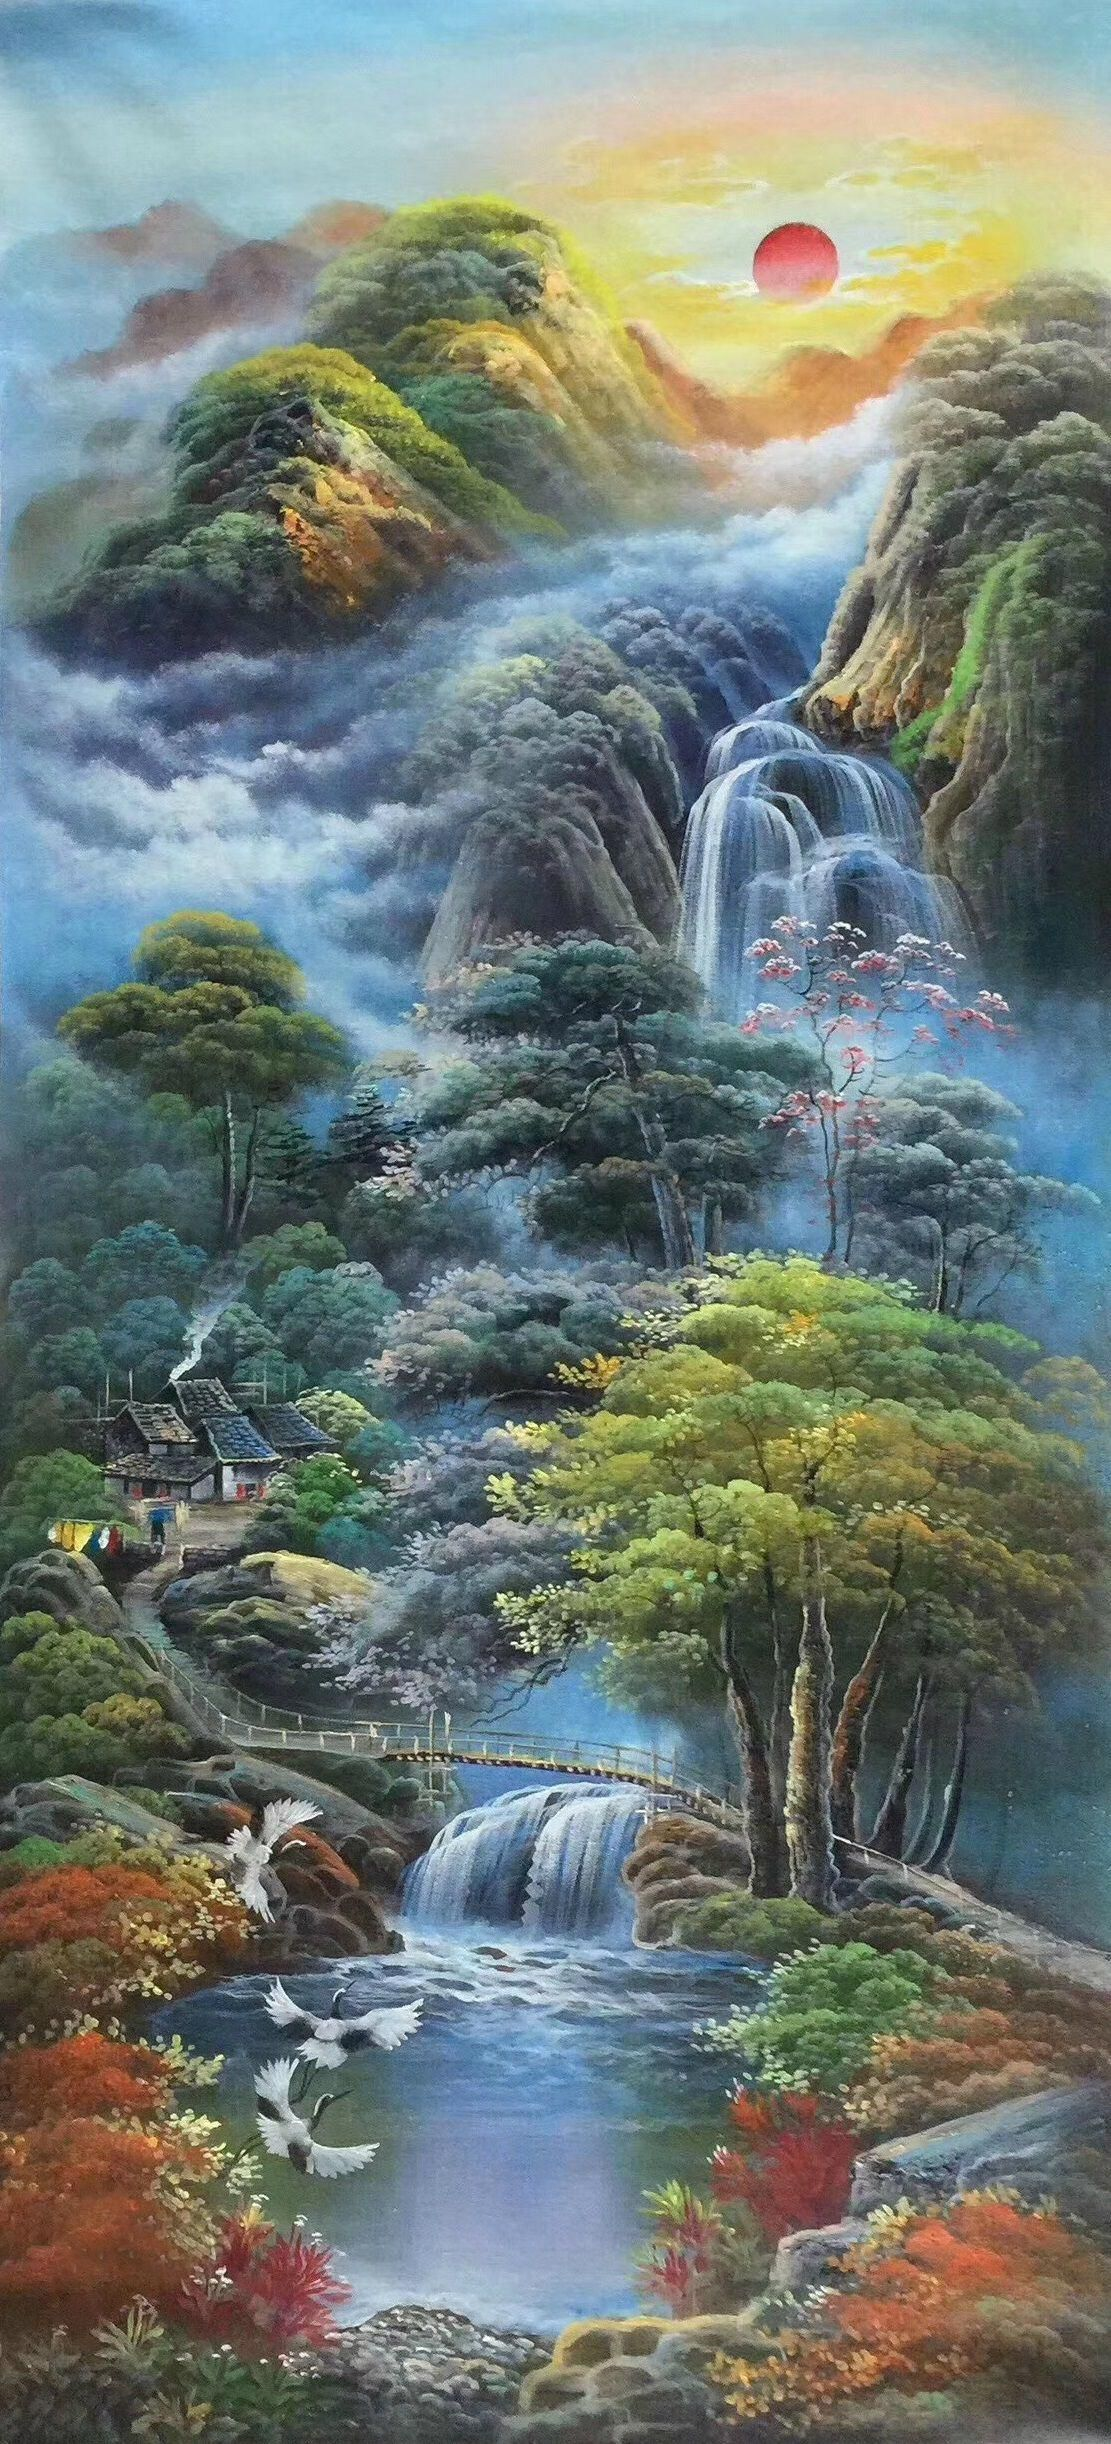 Id 383 Size 70x180cm 30 X72 Inch 100 Hand Made Oil Painting Decoration Murals Art Home Decor Wall De Landscape Paintings Nature Paintings Chinese Landscape